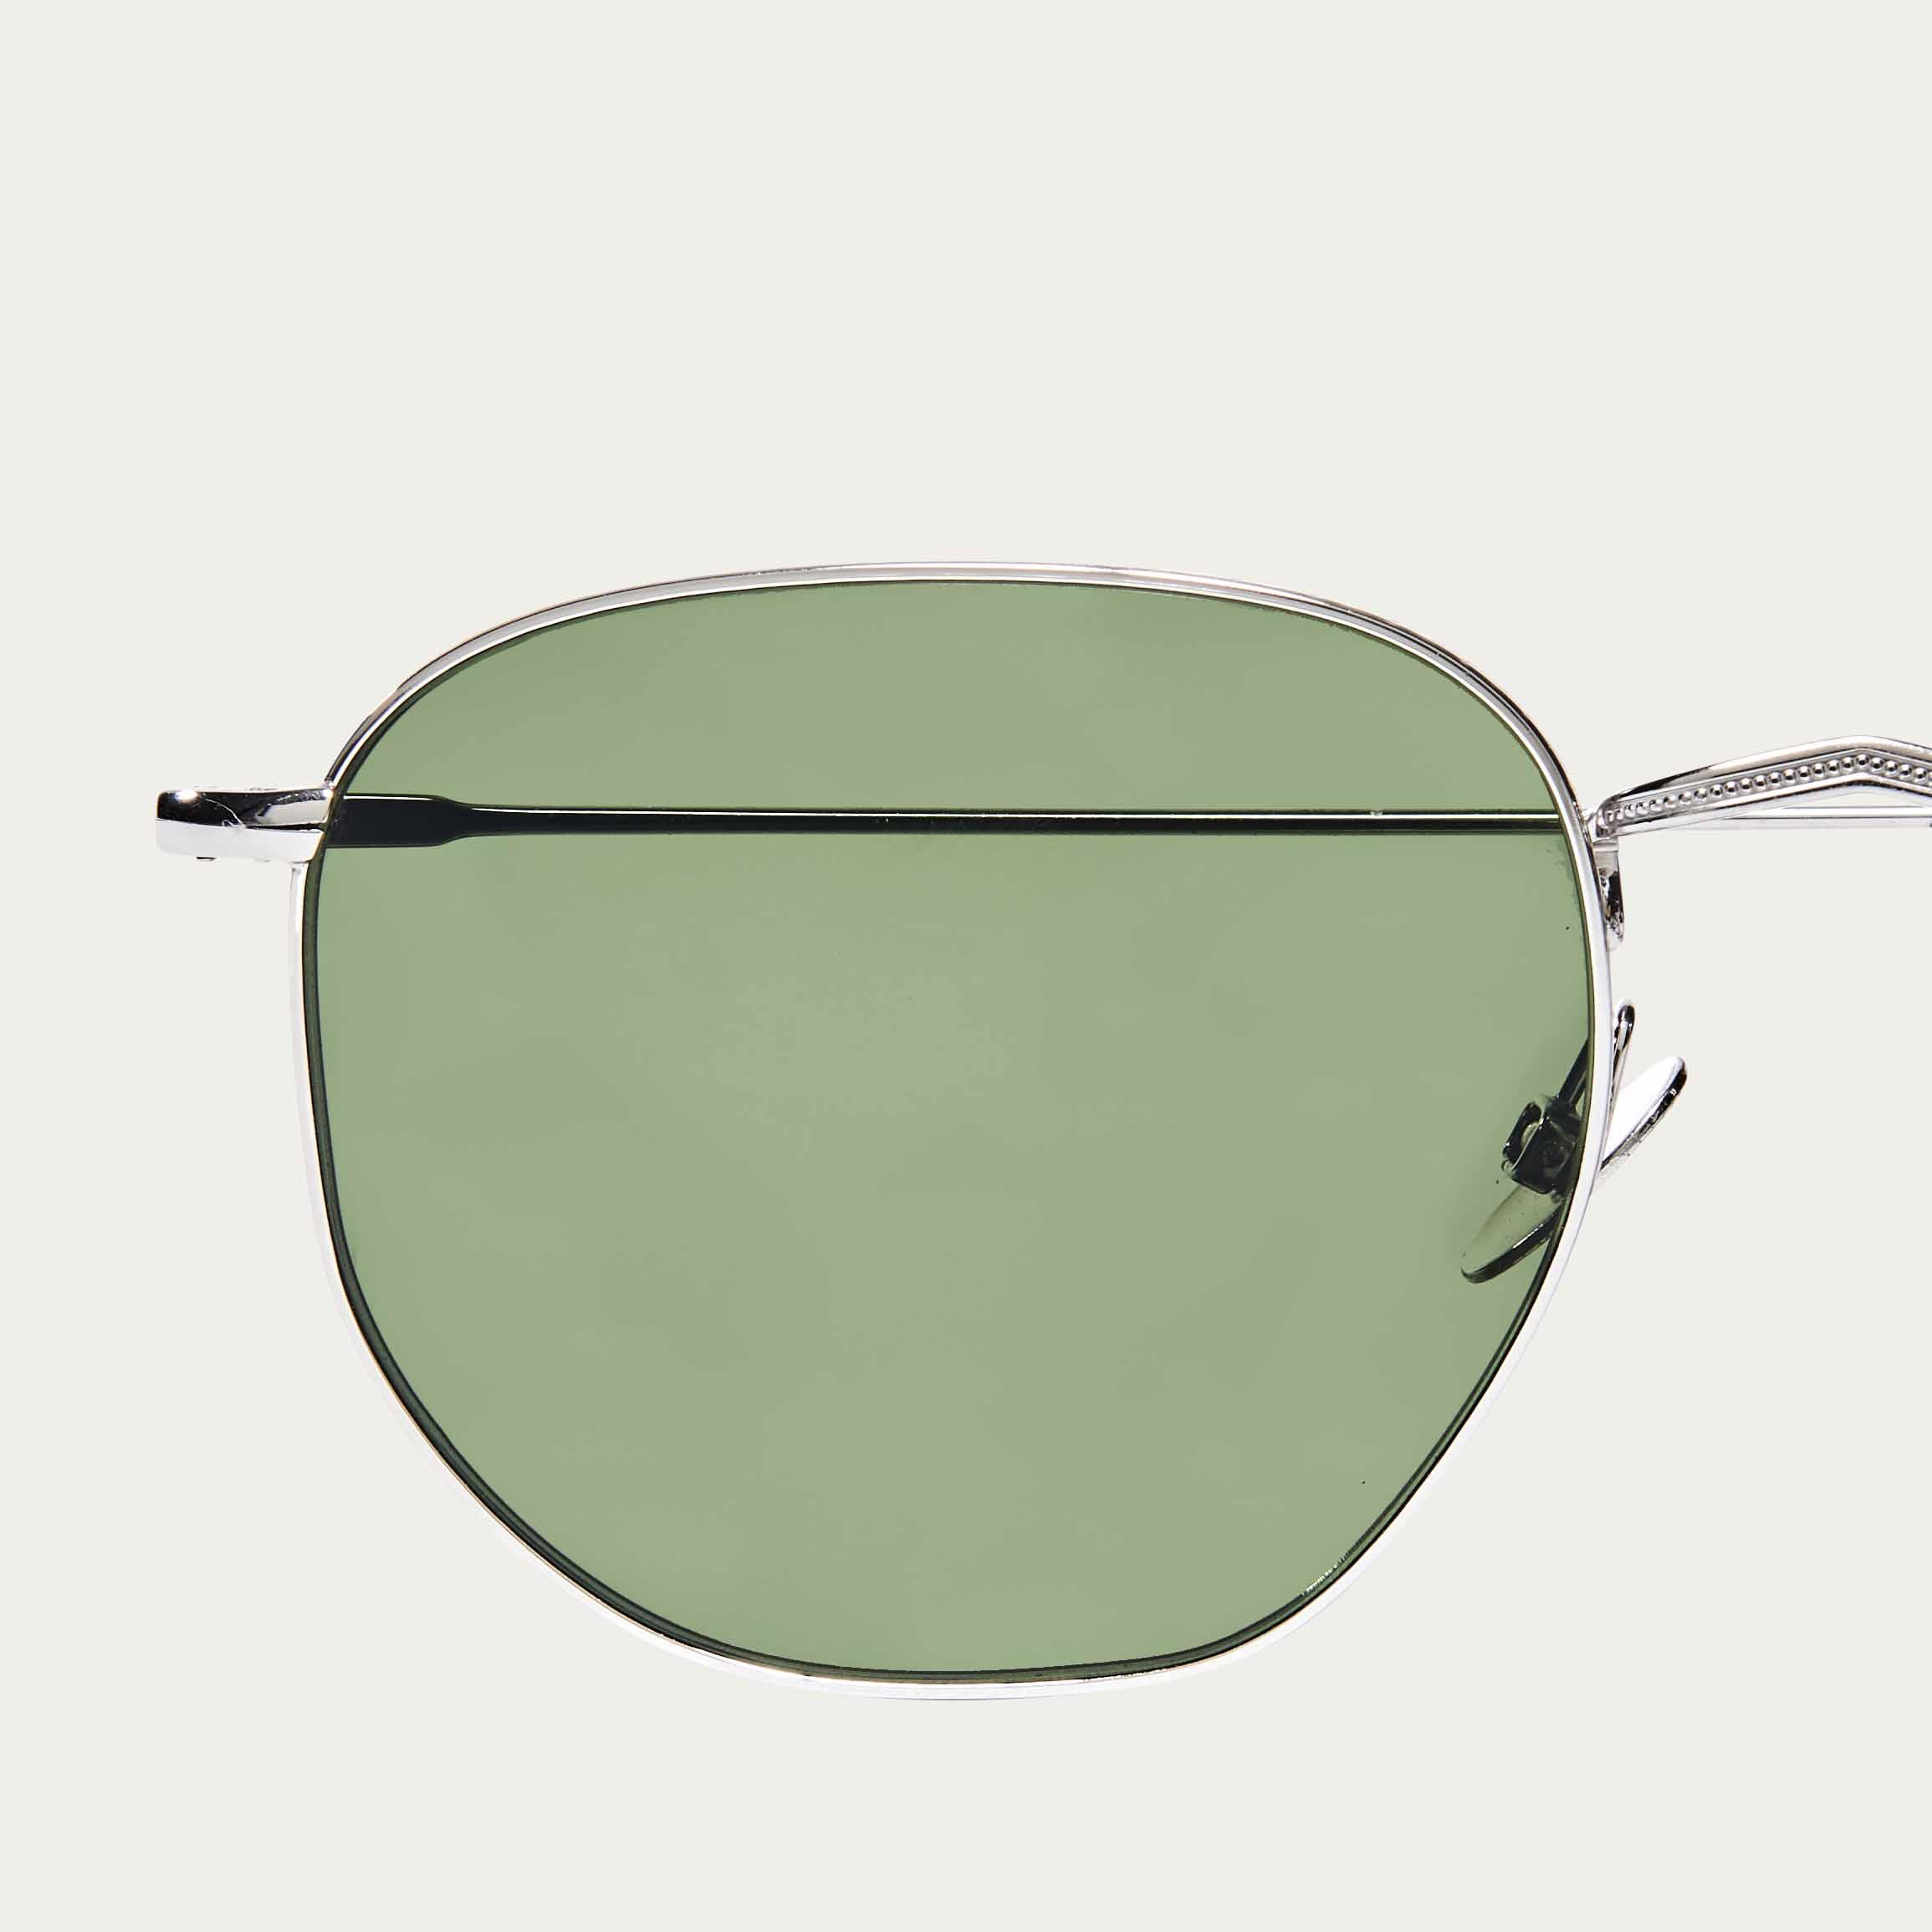 Rhodium / Bottle Green Mohair Sunglasses | Bombinate